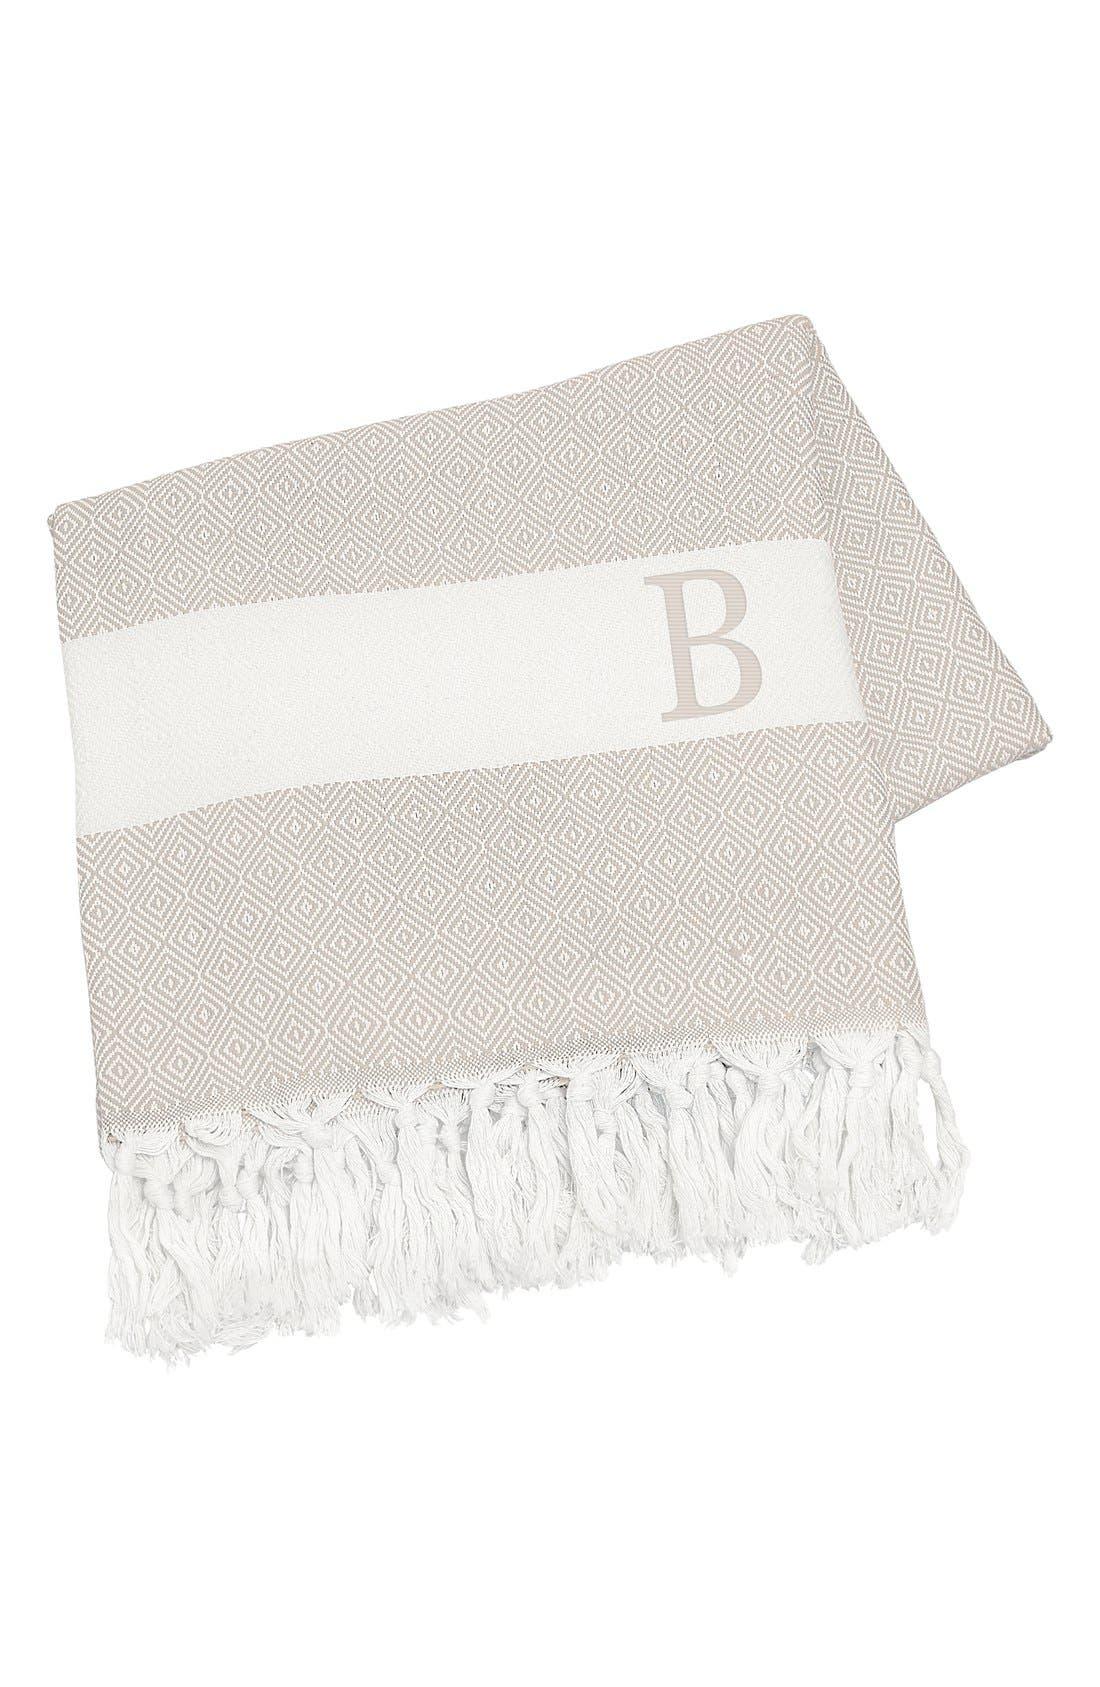 Monogram Turkish Cotton Throw,                         Main,                         color, Beige - B